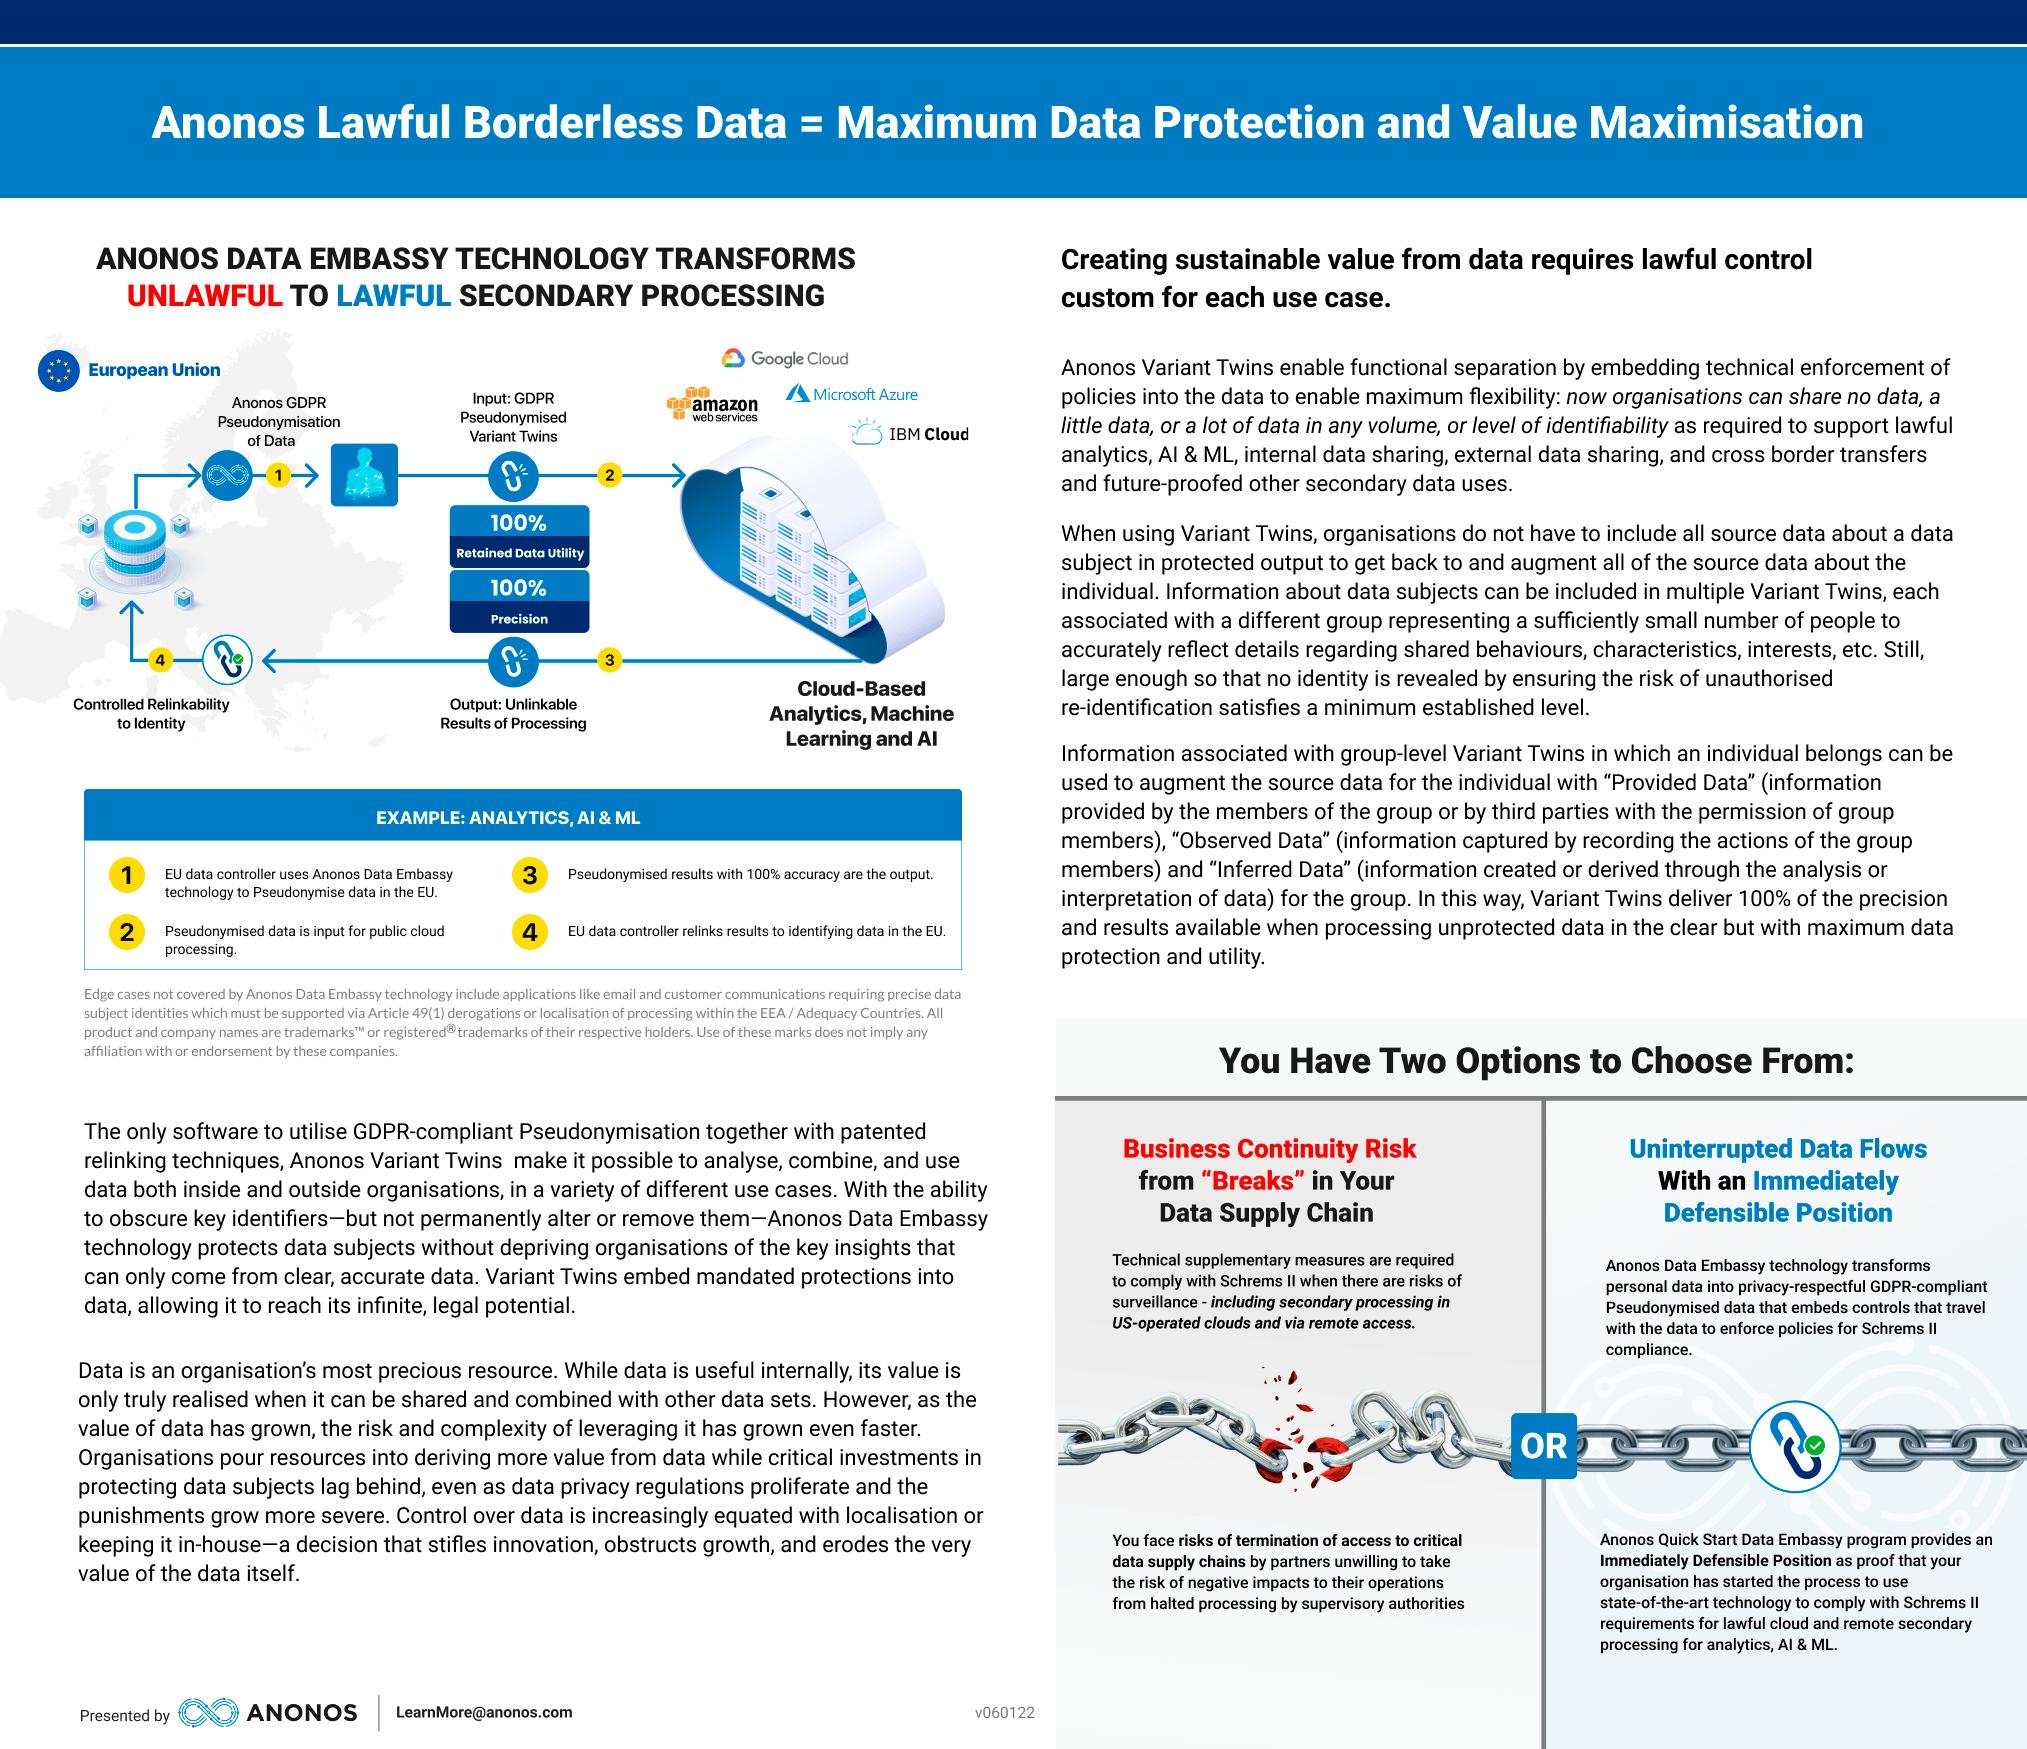 Anonos Lawful Borderless Data = Maximum Data Protection and Value Maximisation